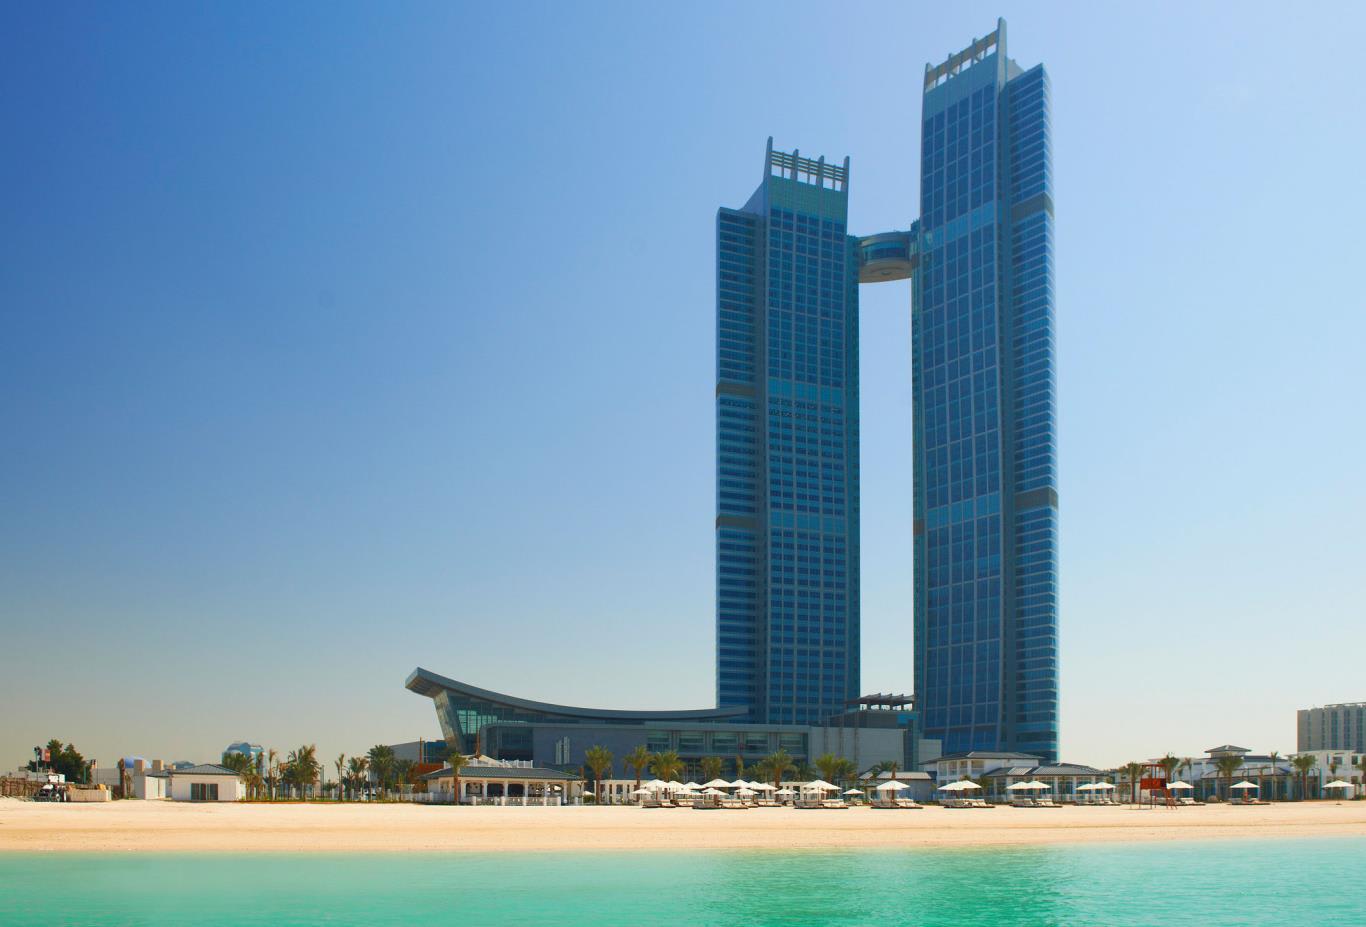 St Regis Corniche Abu Dhabi